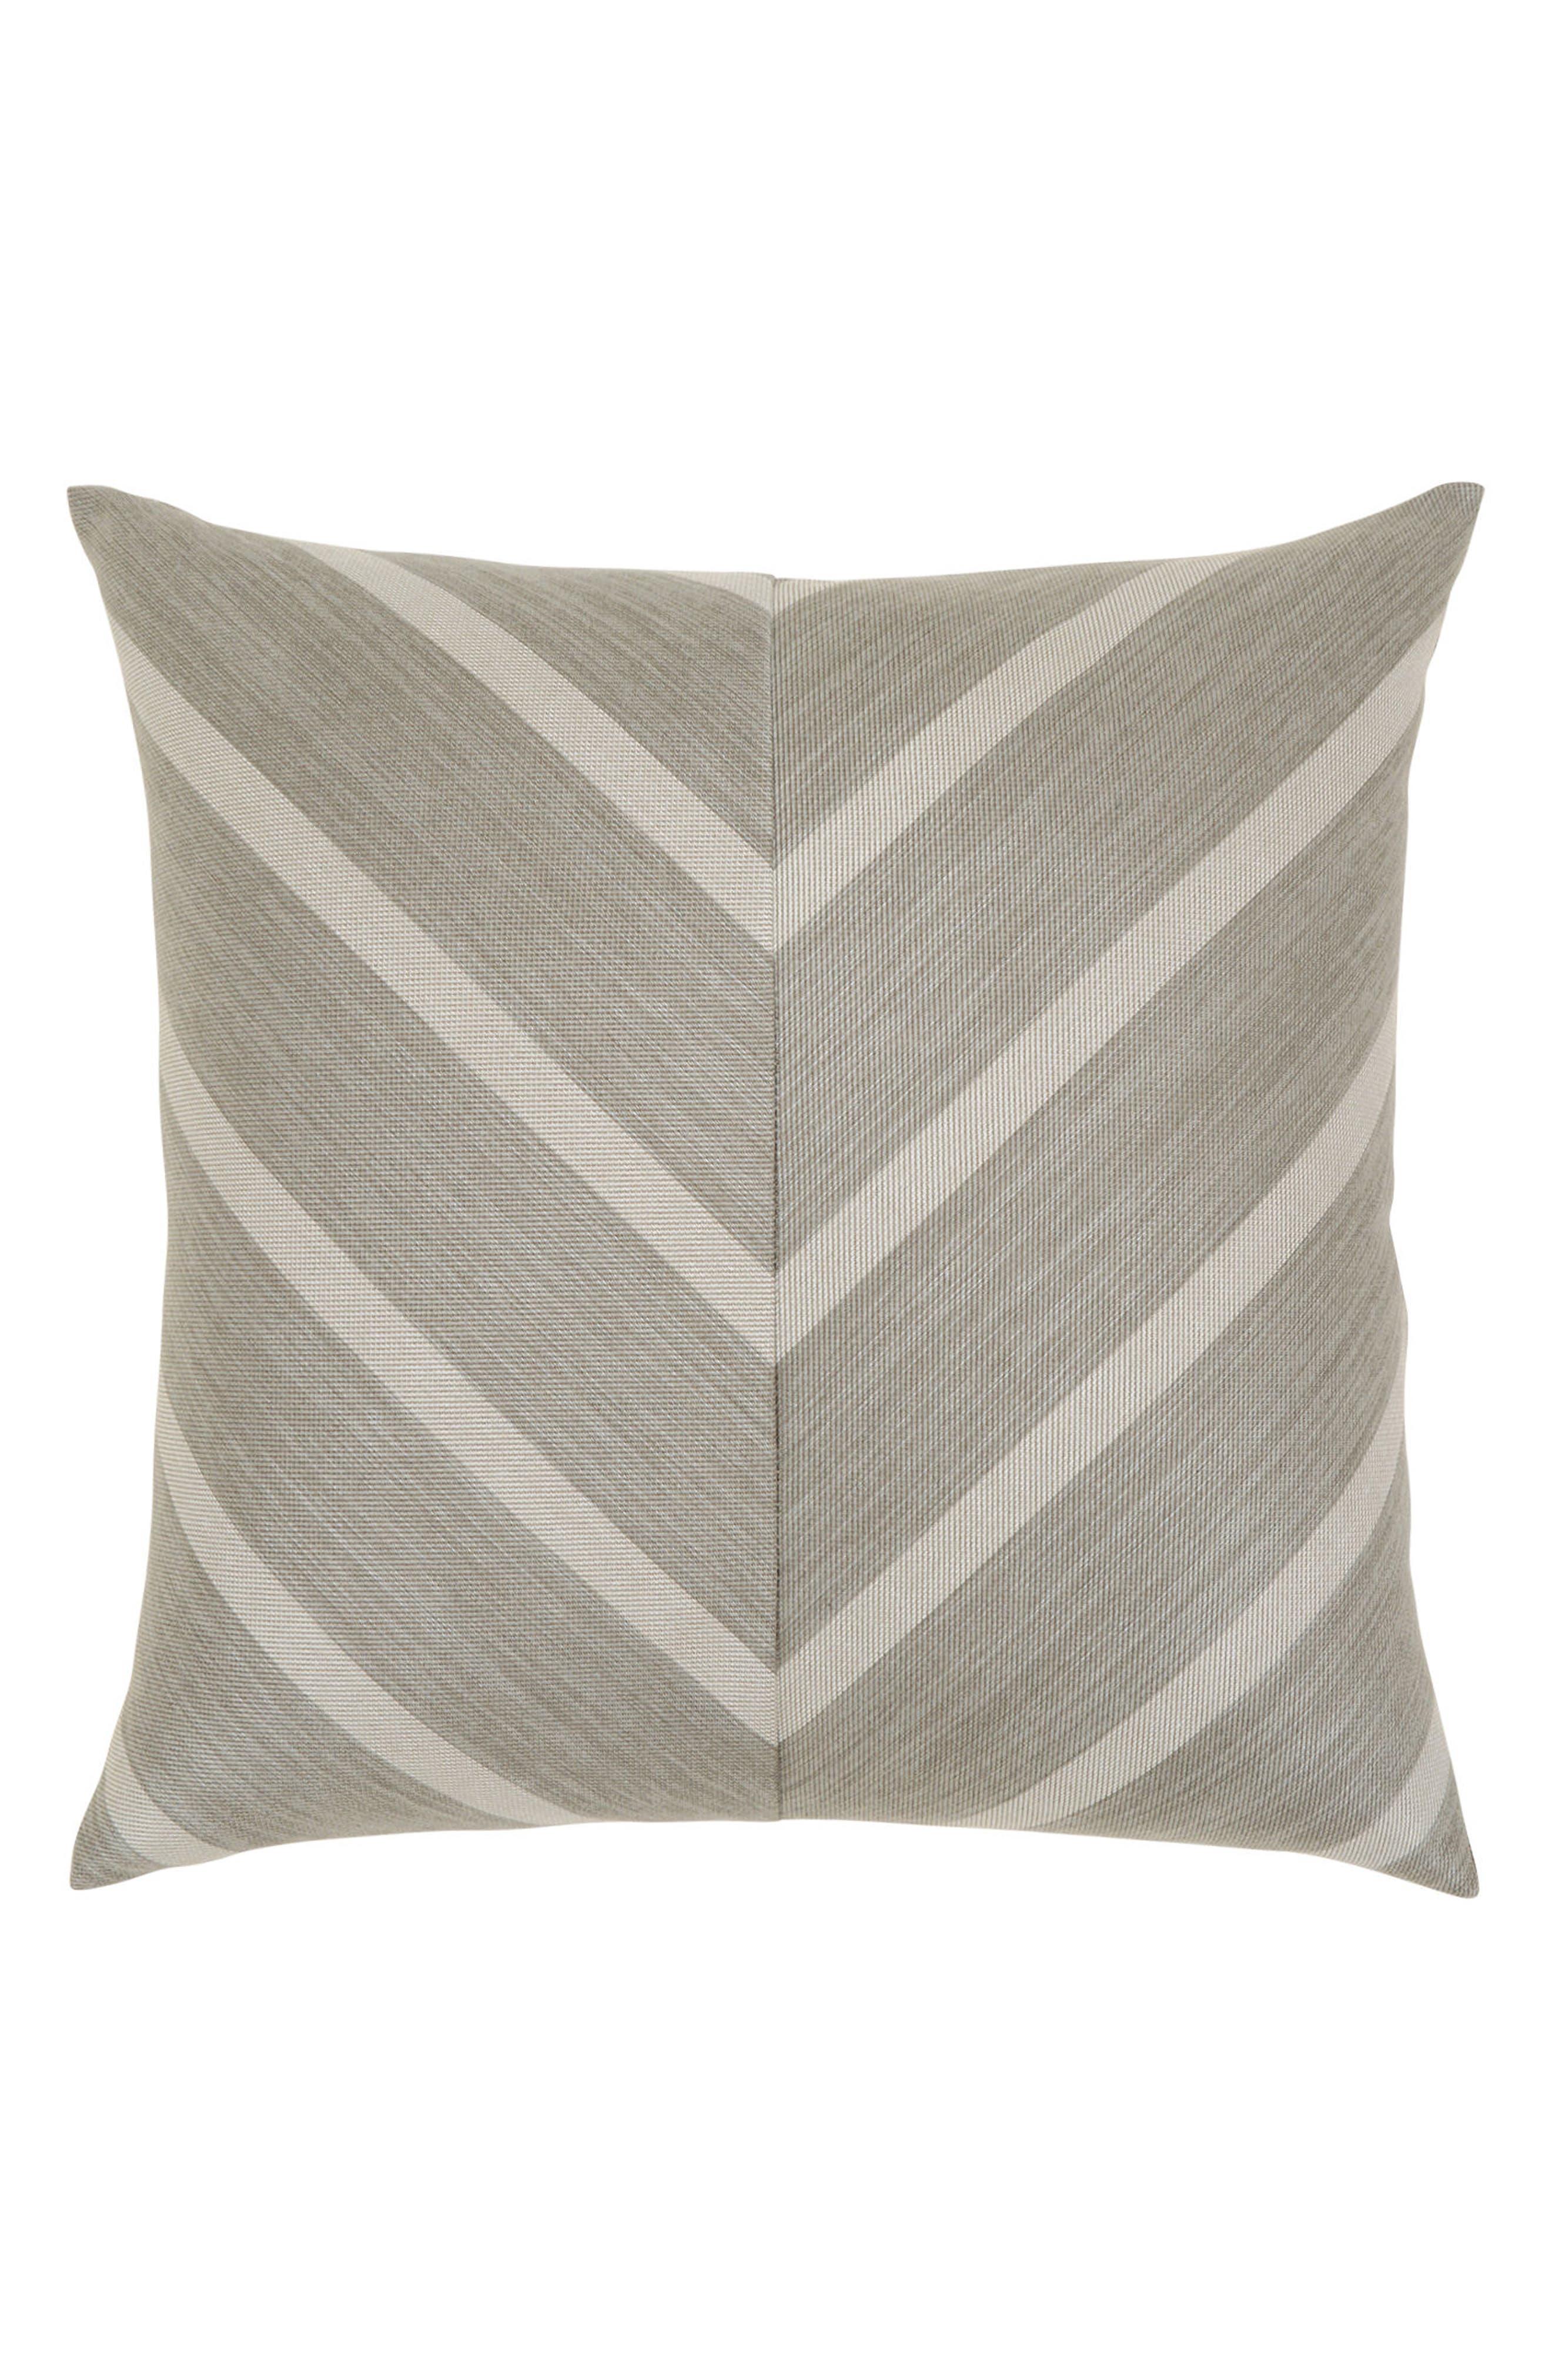 Sparkle Chevron Indoor/Outdoor Accent Pillow,                             Main thumbnail 1, color,                             Grey